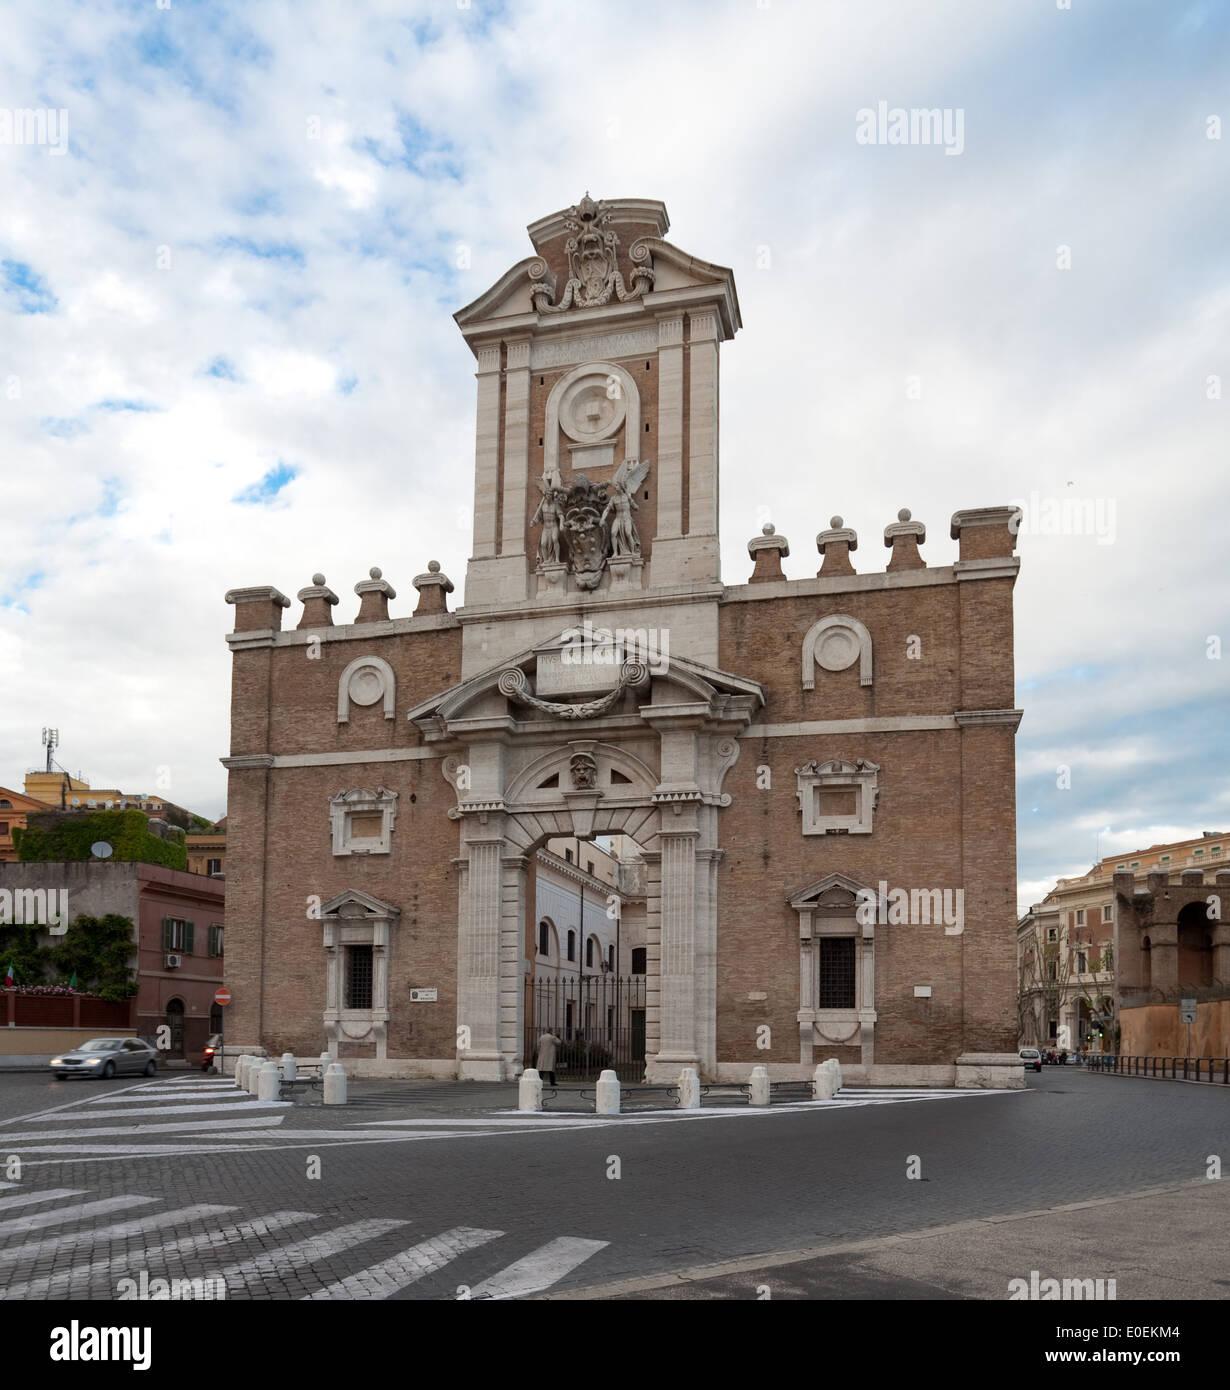 Porta Pia, Rom, Italien - Porta Pia, Rome, Italy - Stock Image